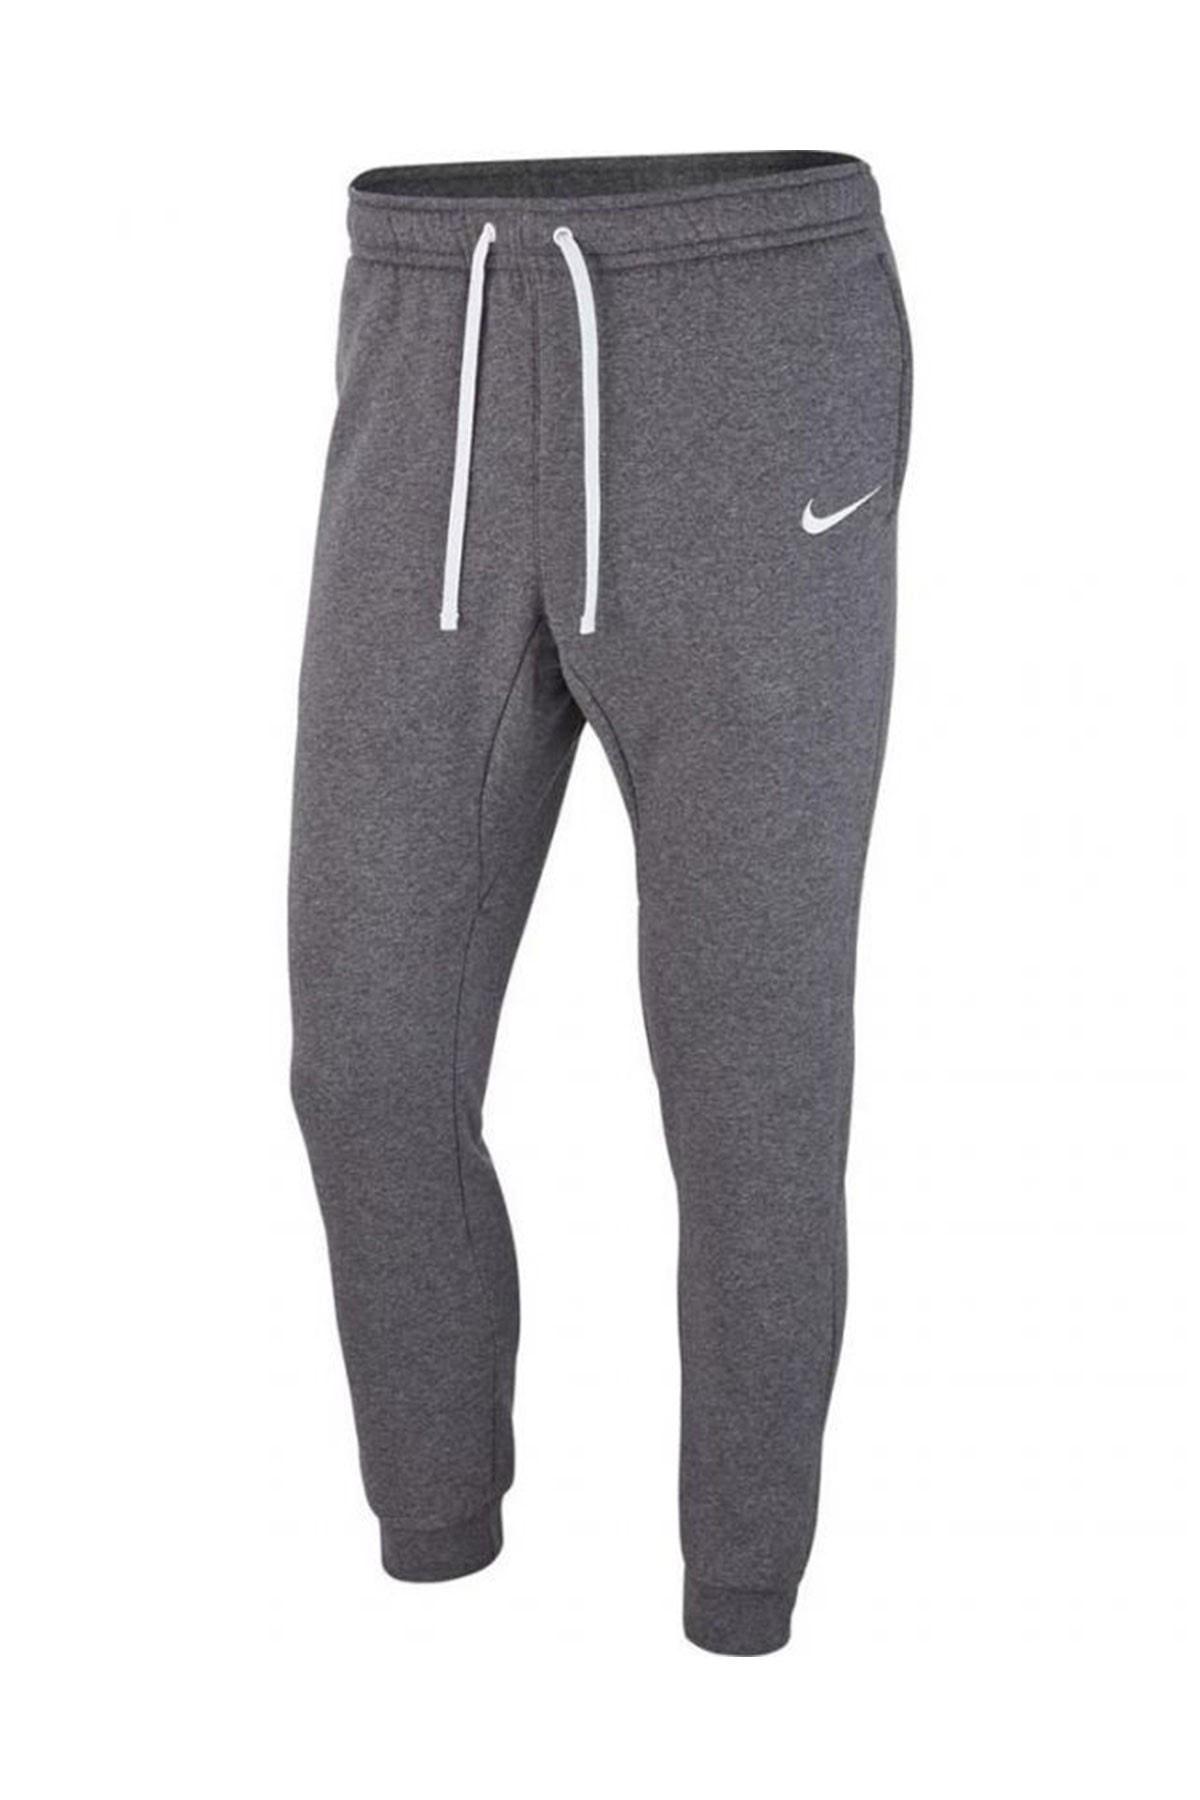 Nike Mor - Siyah Çocuk Cfd Pant Flc Tm Club19 Eşofman Altı 0